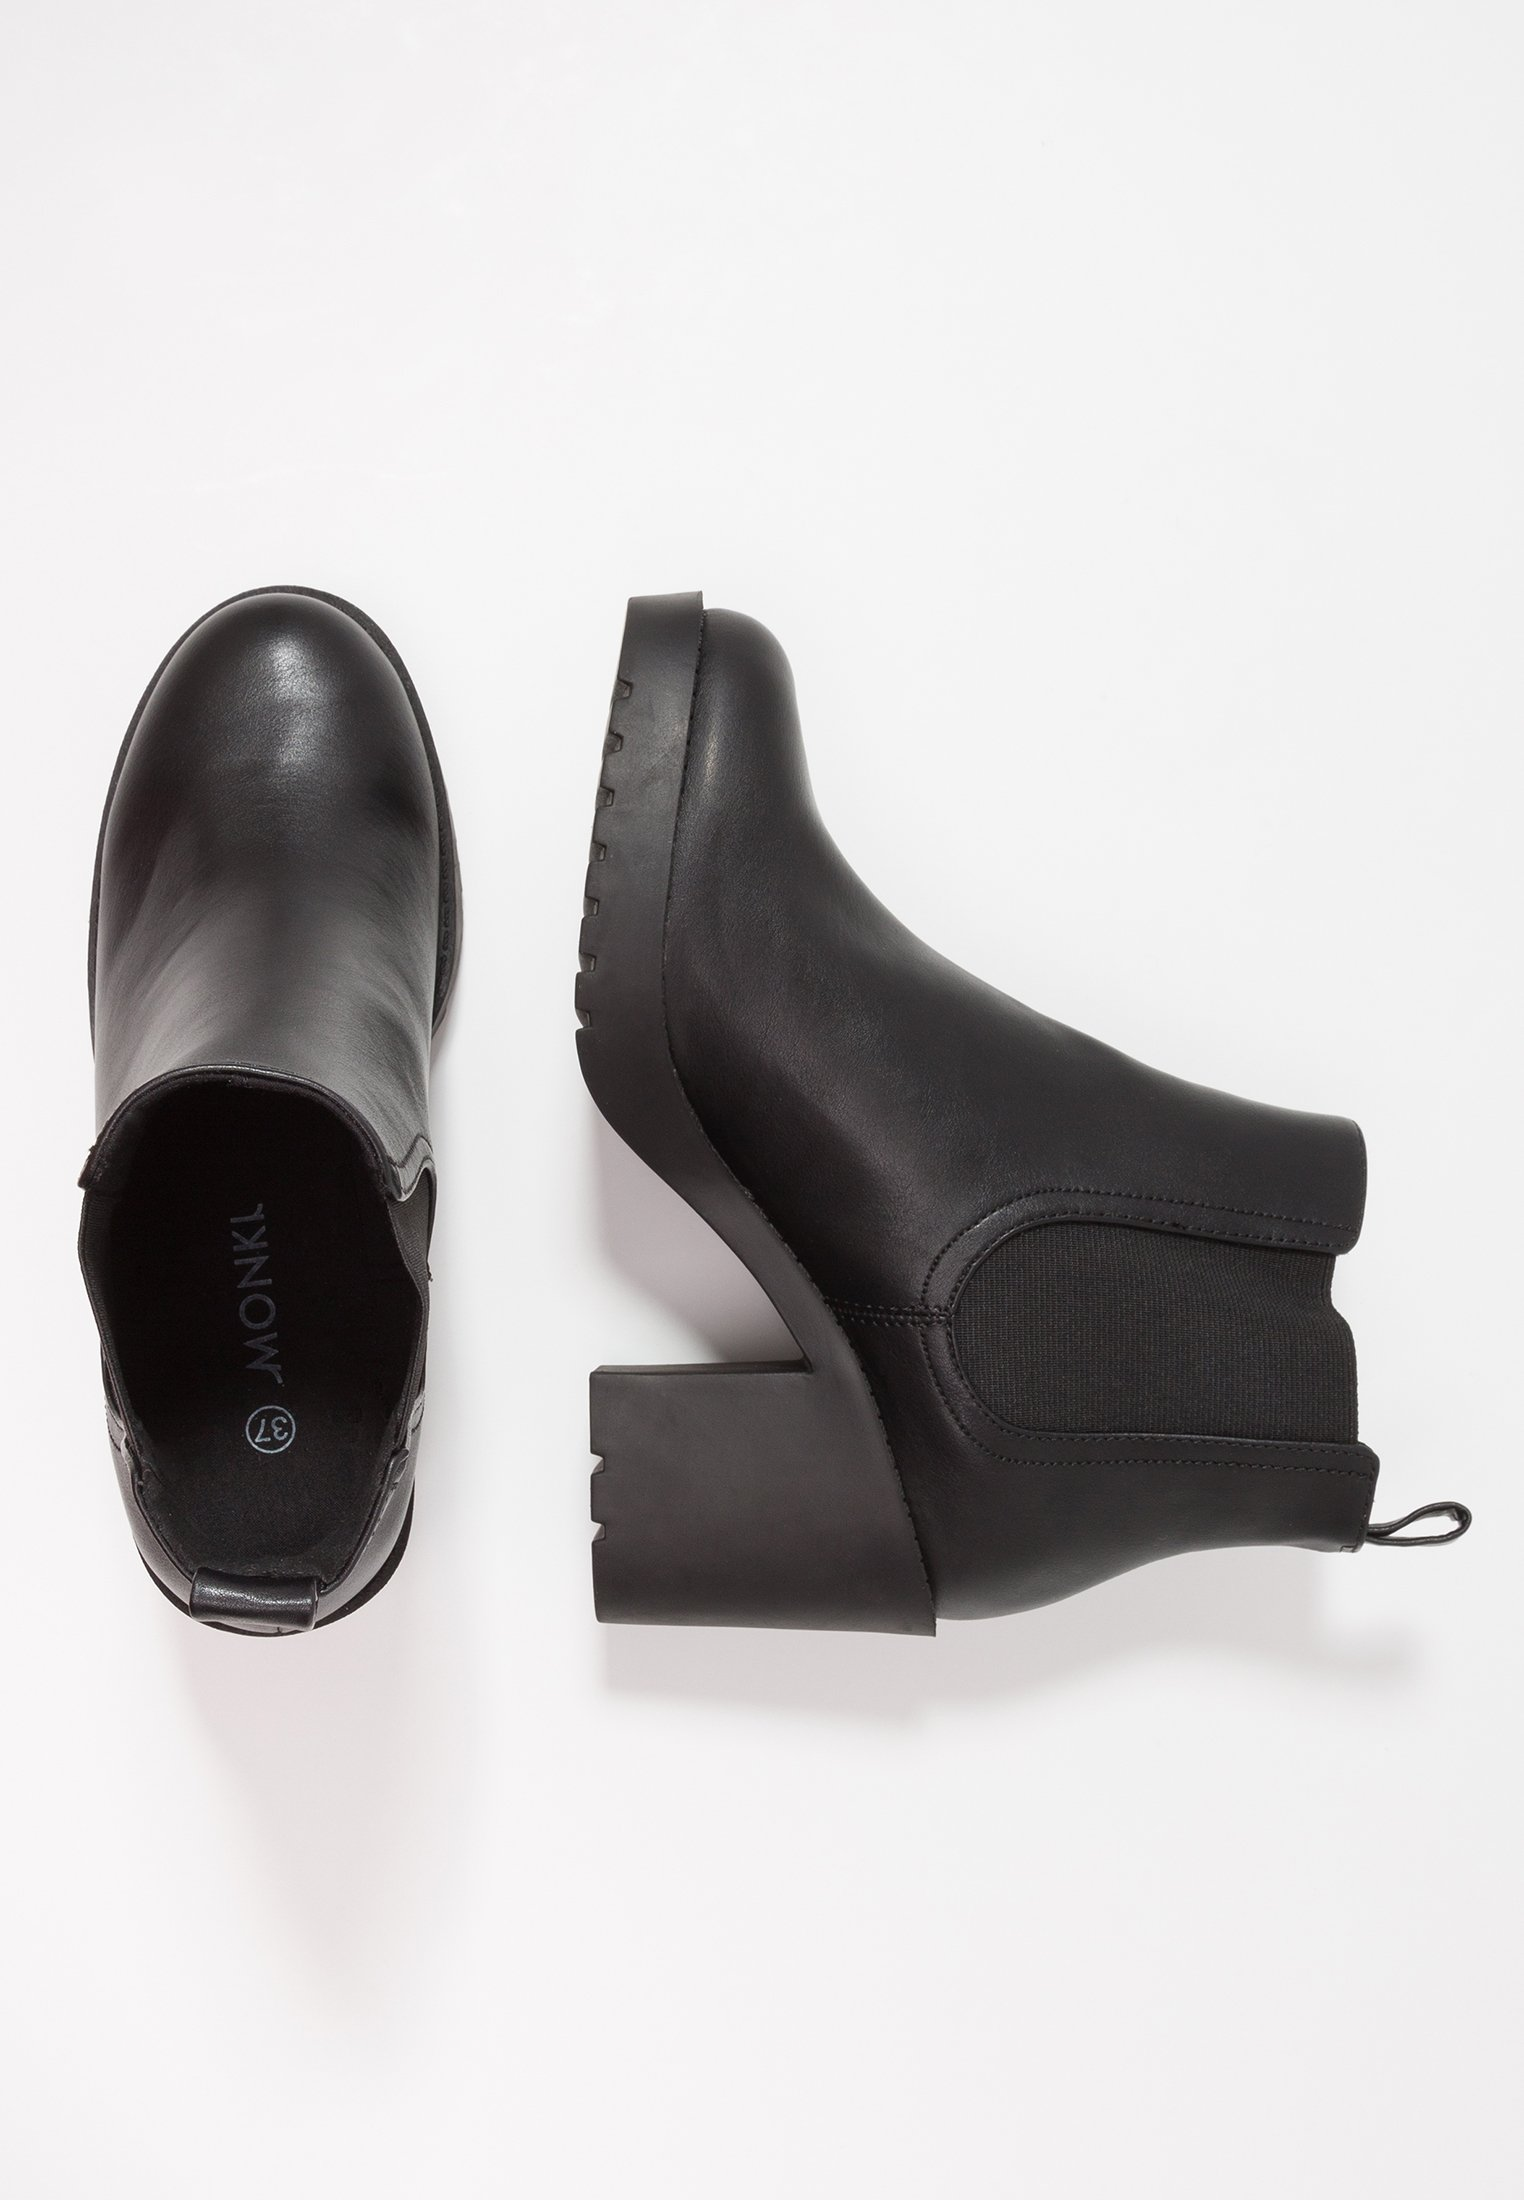 MINOU Ankelboots black